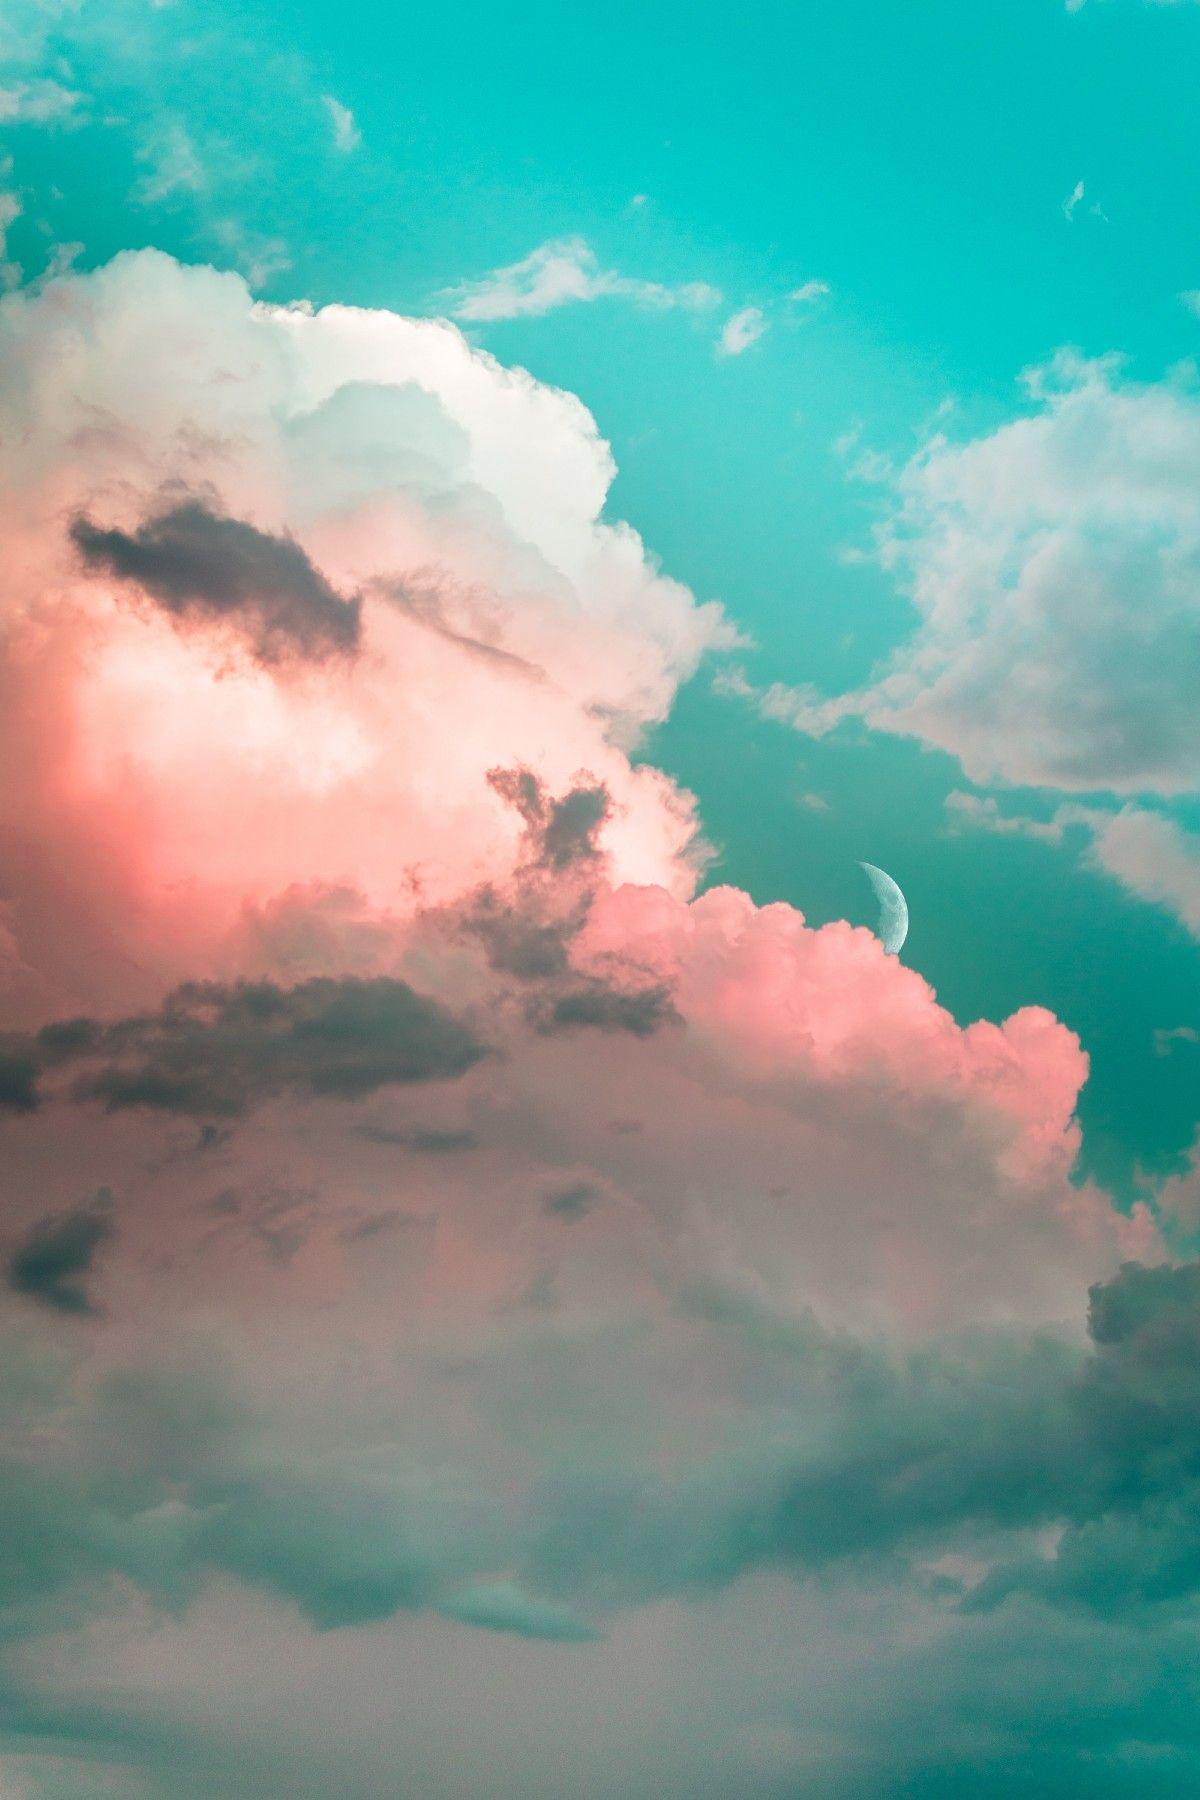 Aesthetic Cloud Wallpaper Hd